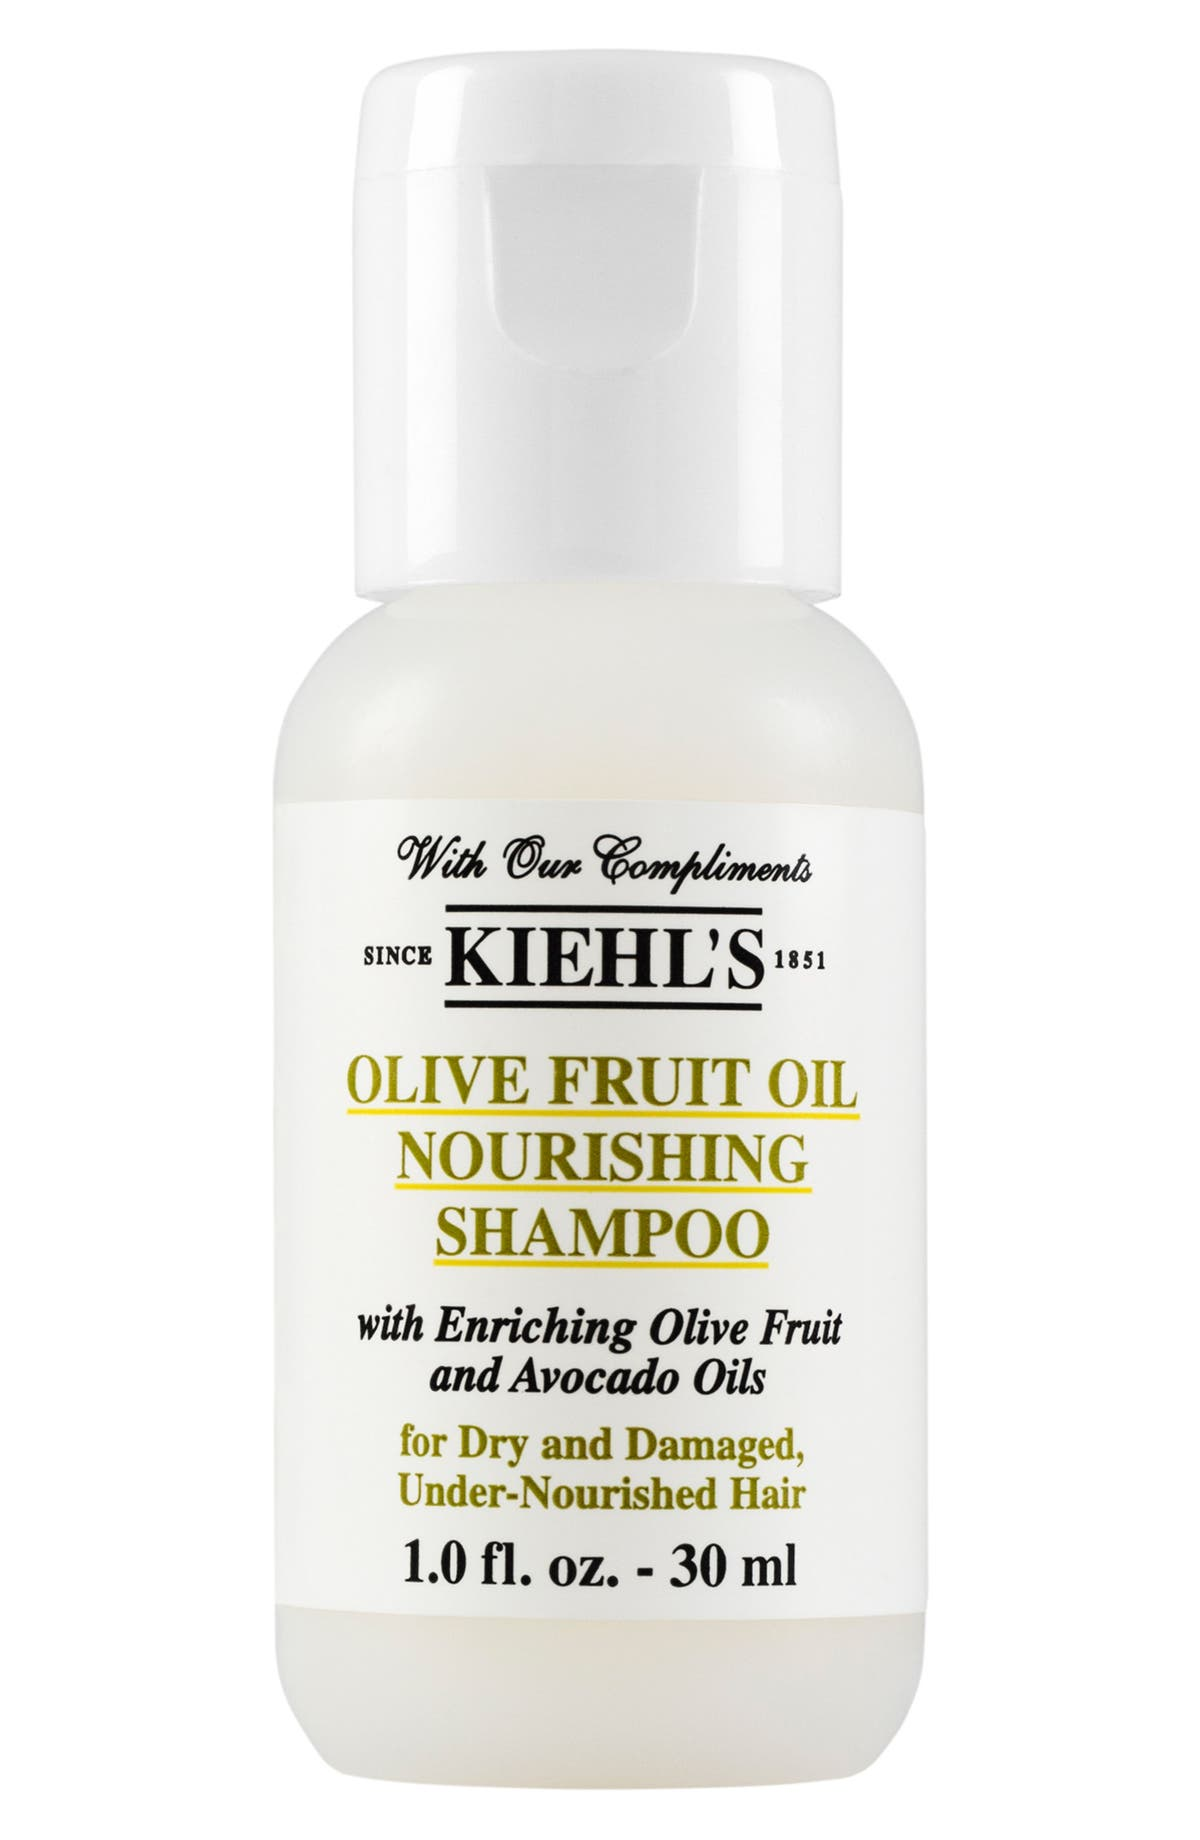 Kiehls Since 1851 Olive Fruit Oil Nourishing Shampoo Nordstrom Beauty Barn Baby All Over